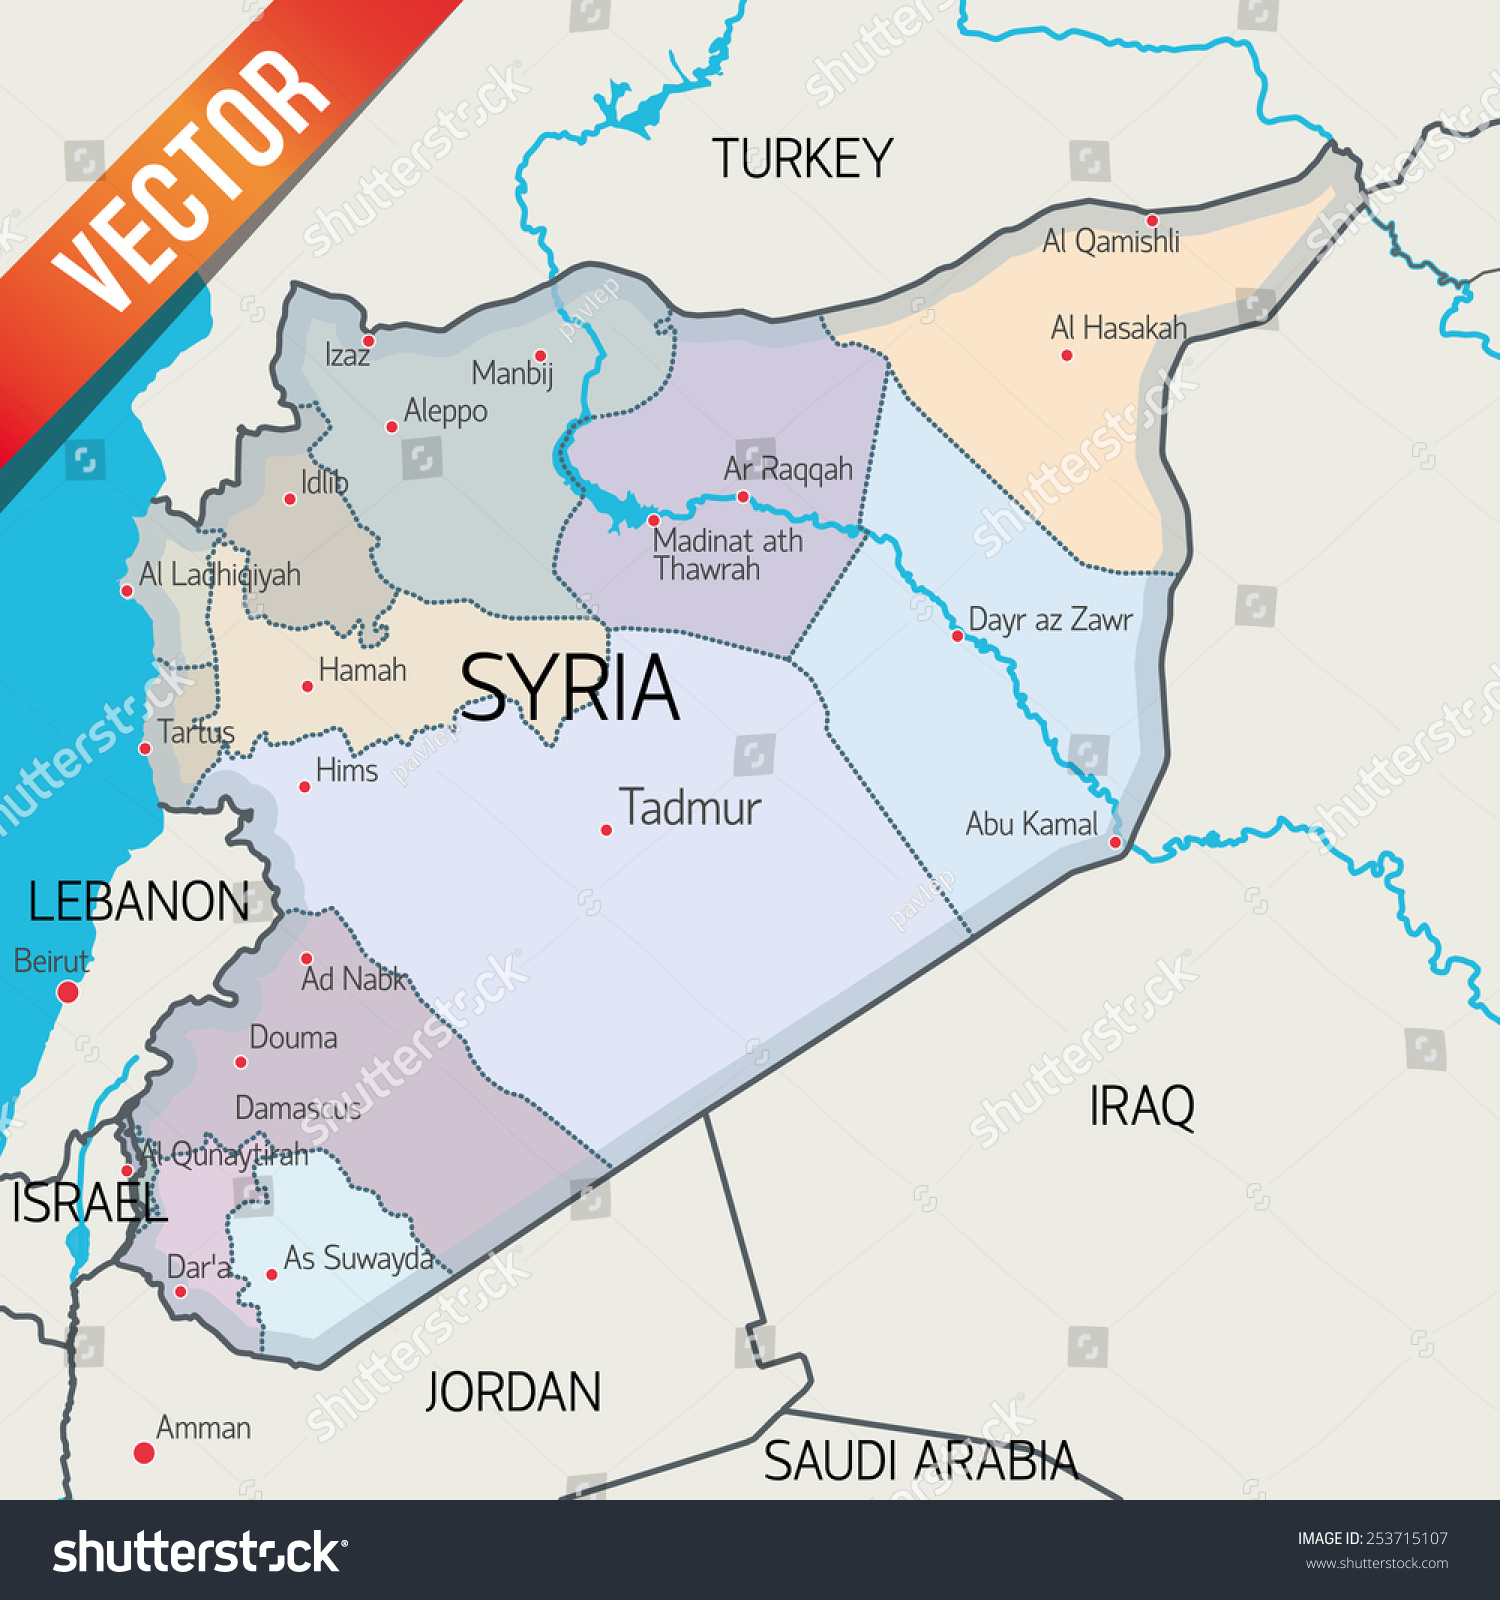 Syria Vector Map Stock Vector Shutterstock - Qamishli map